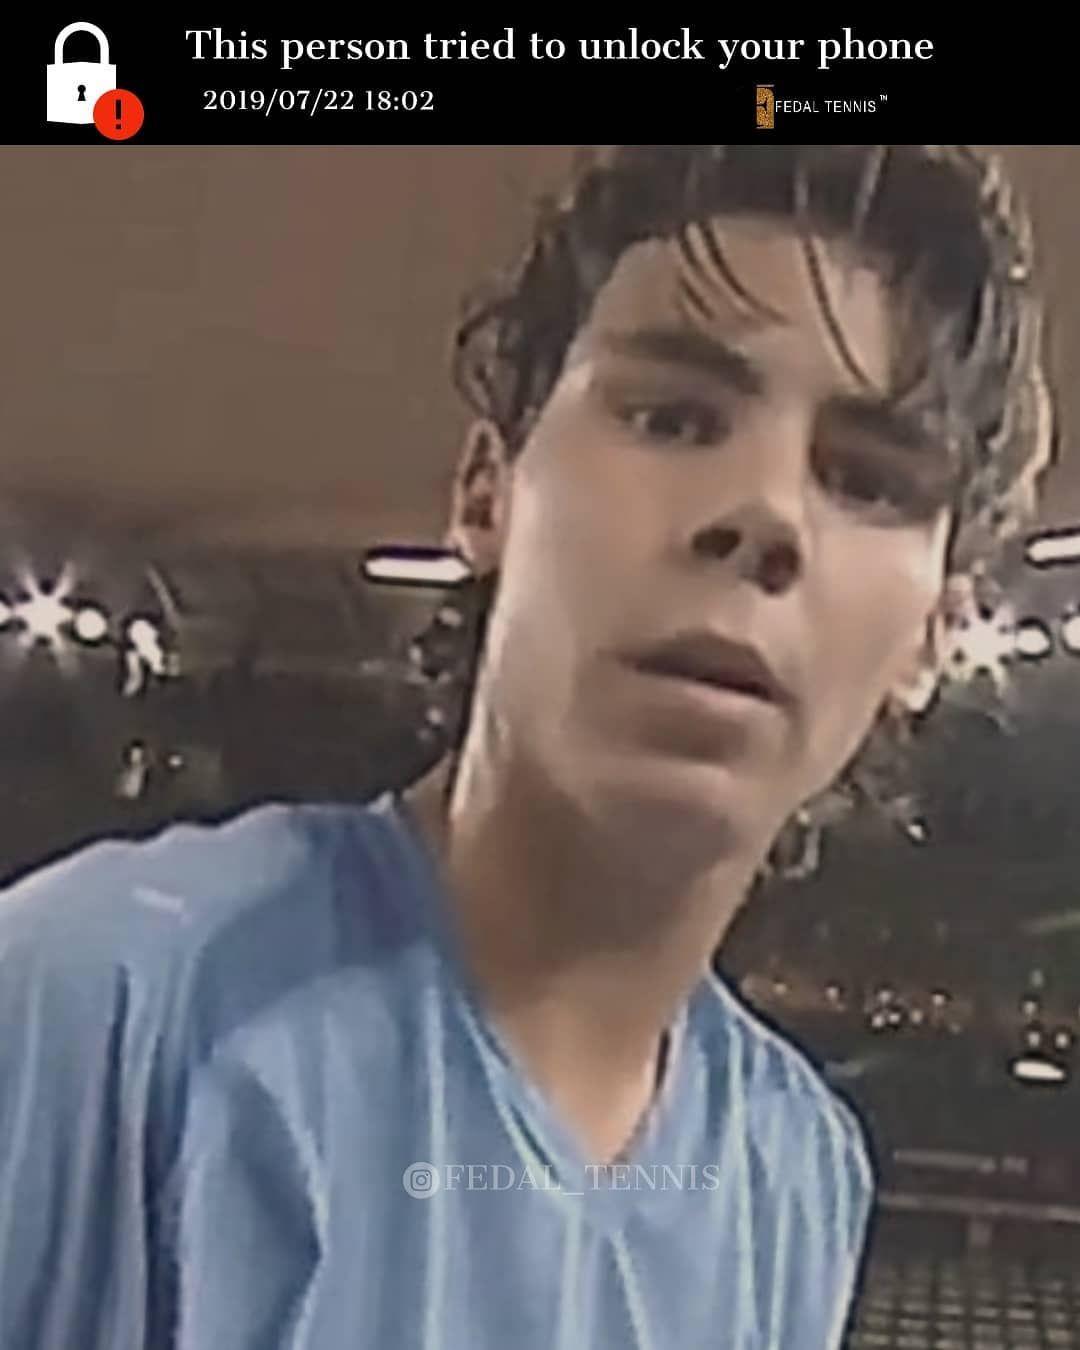 Rafael Nadal Funny Meme Rafaelnadal Rogerfederer Fedal Tennis1 Sports Sport Motivation Tennis Tennisplayer Tenis Sports Memes Rafael Nadal Memes